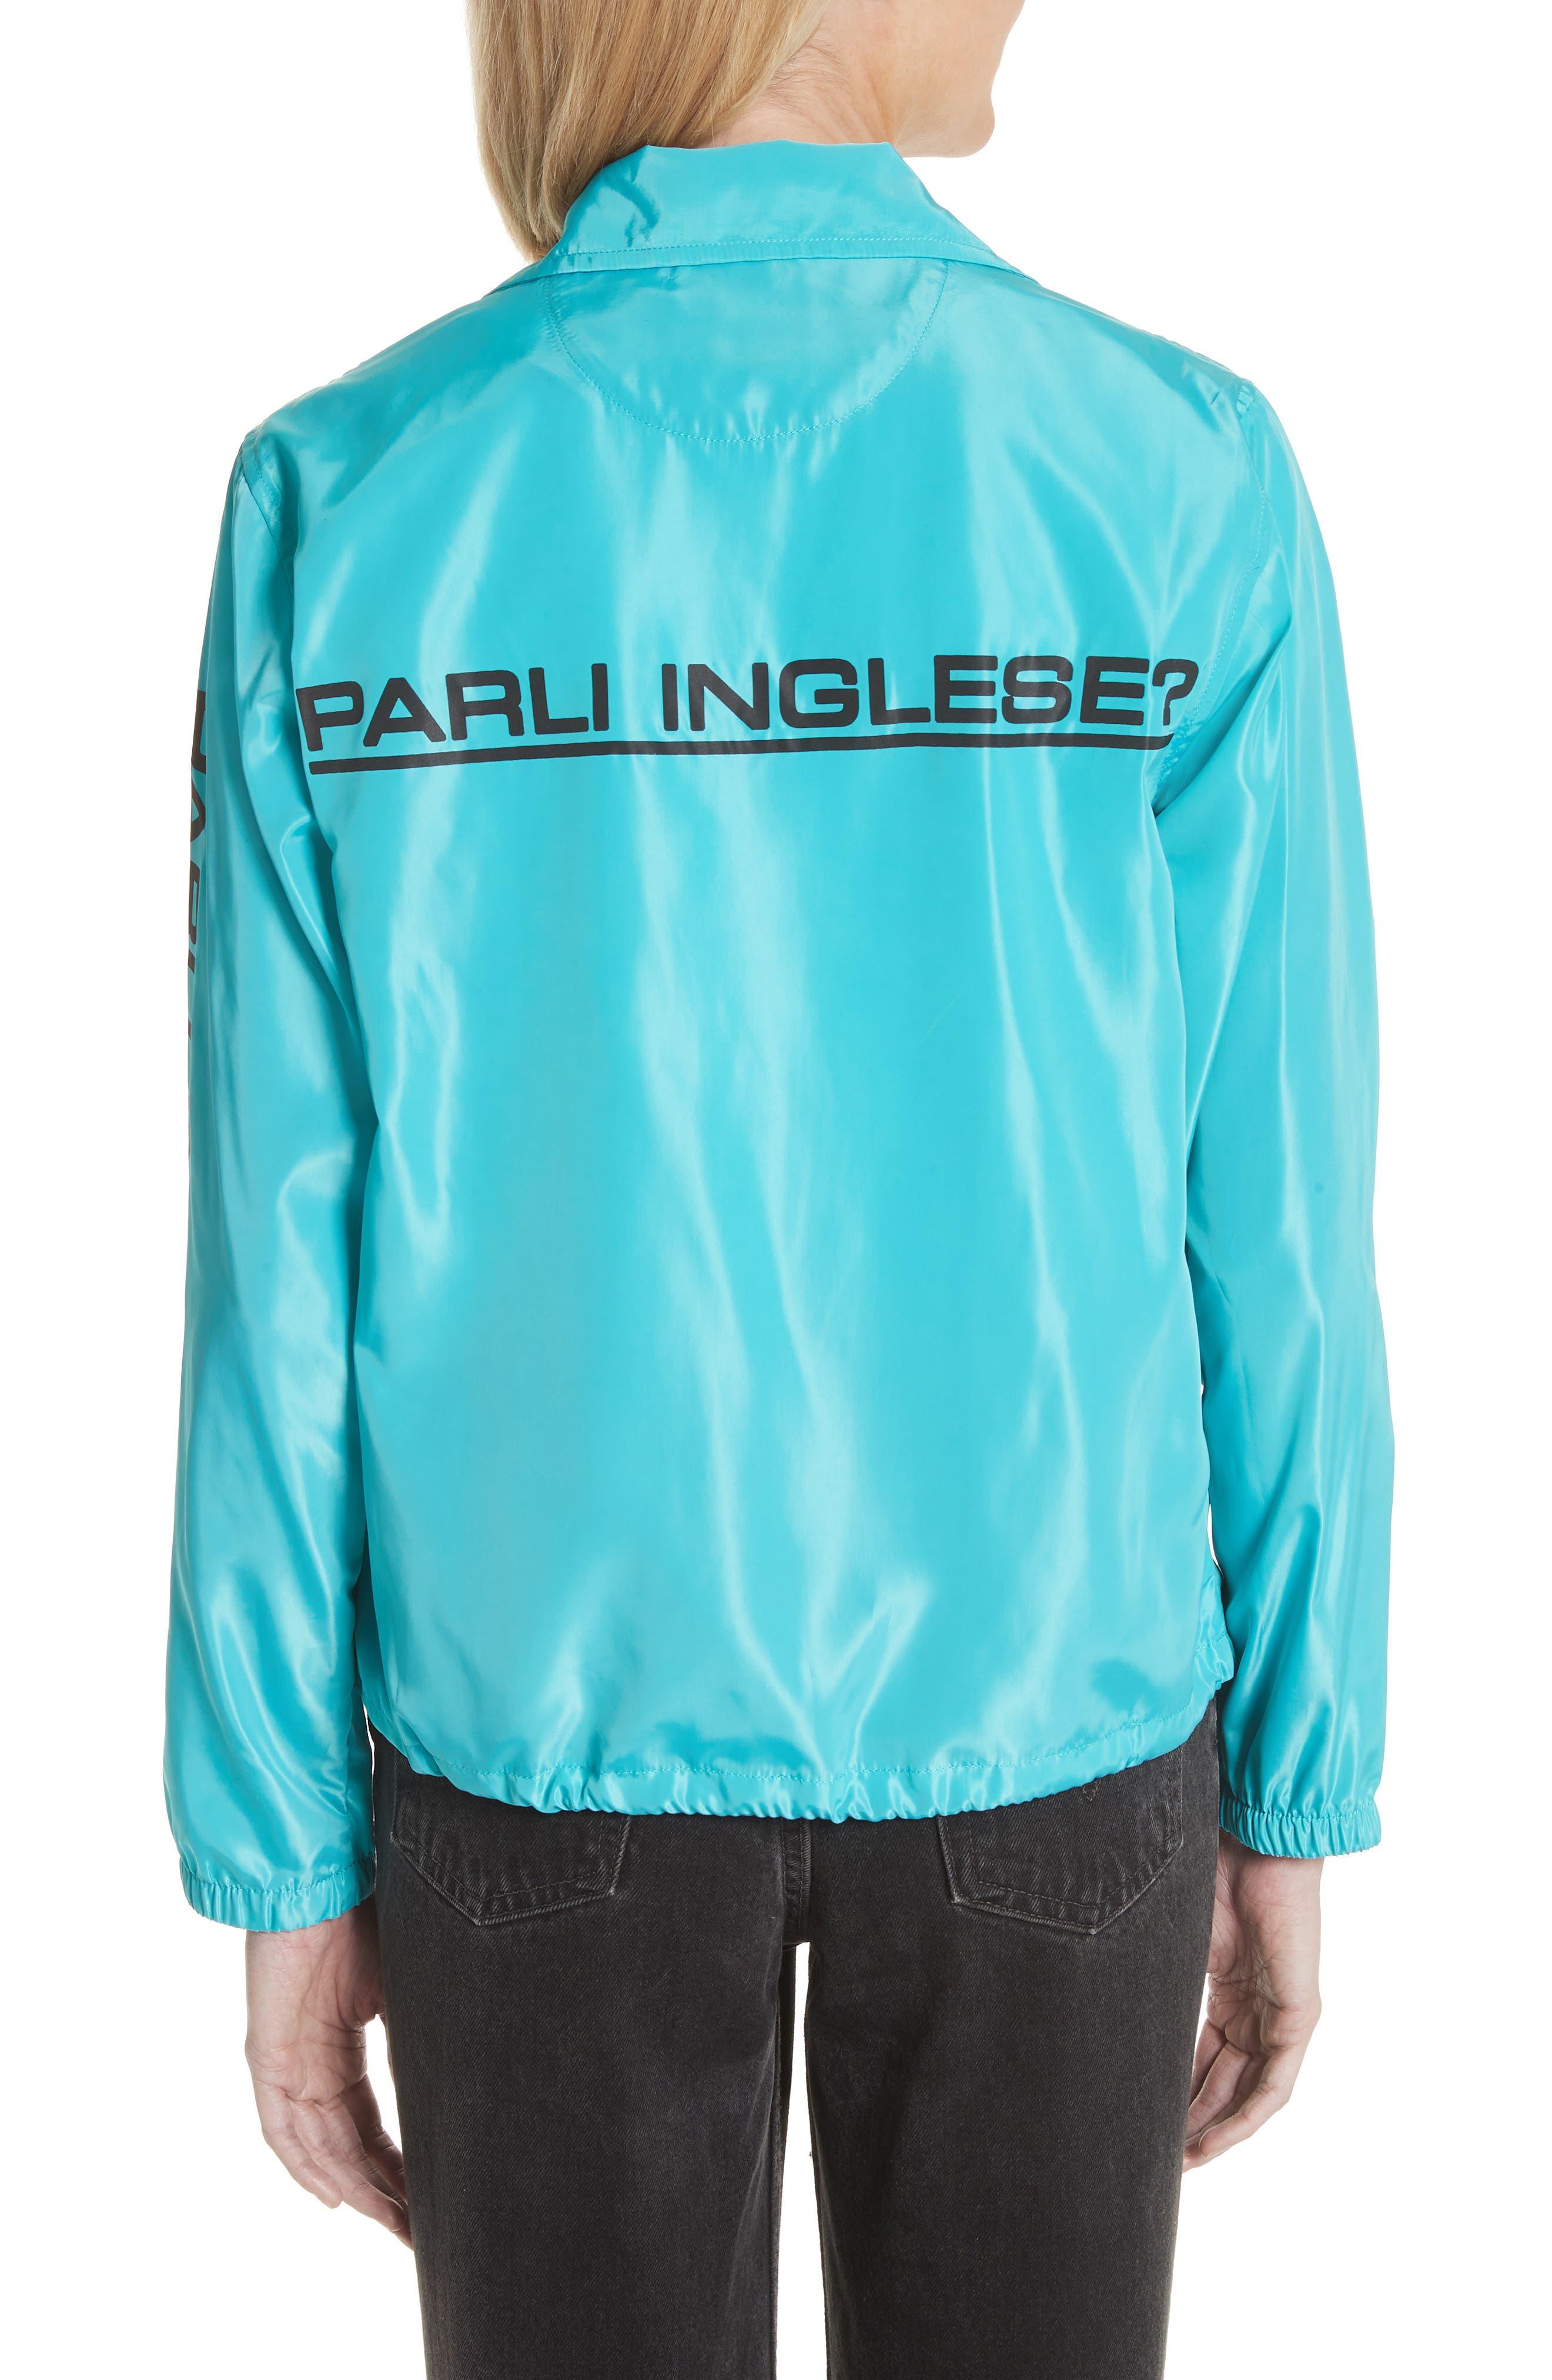 Parli Inglese Coach Jacket,                             Alternate thumbnail 2, color,                             440